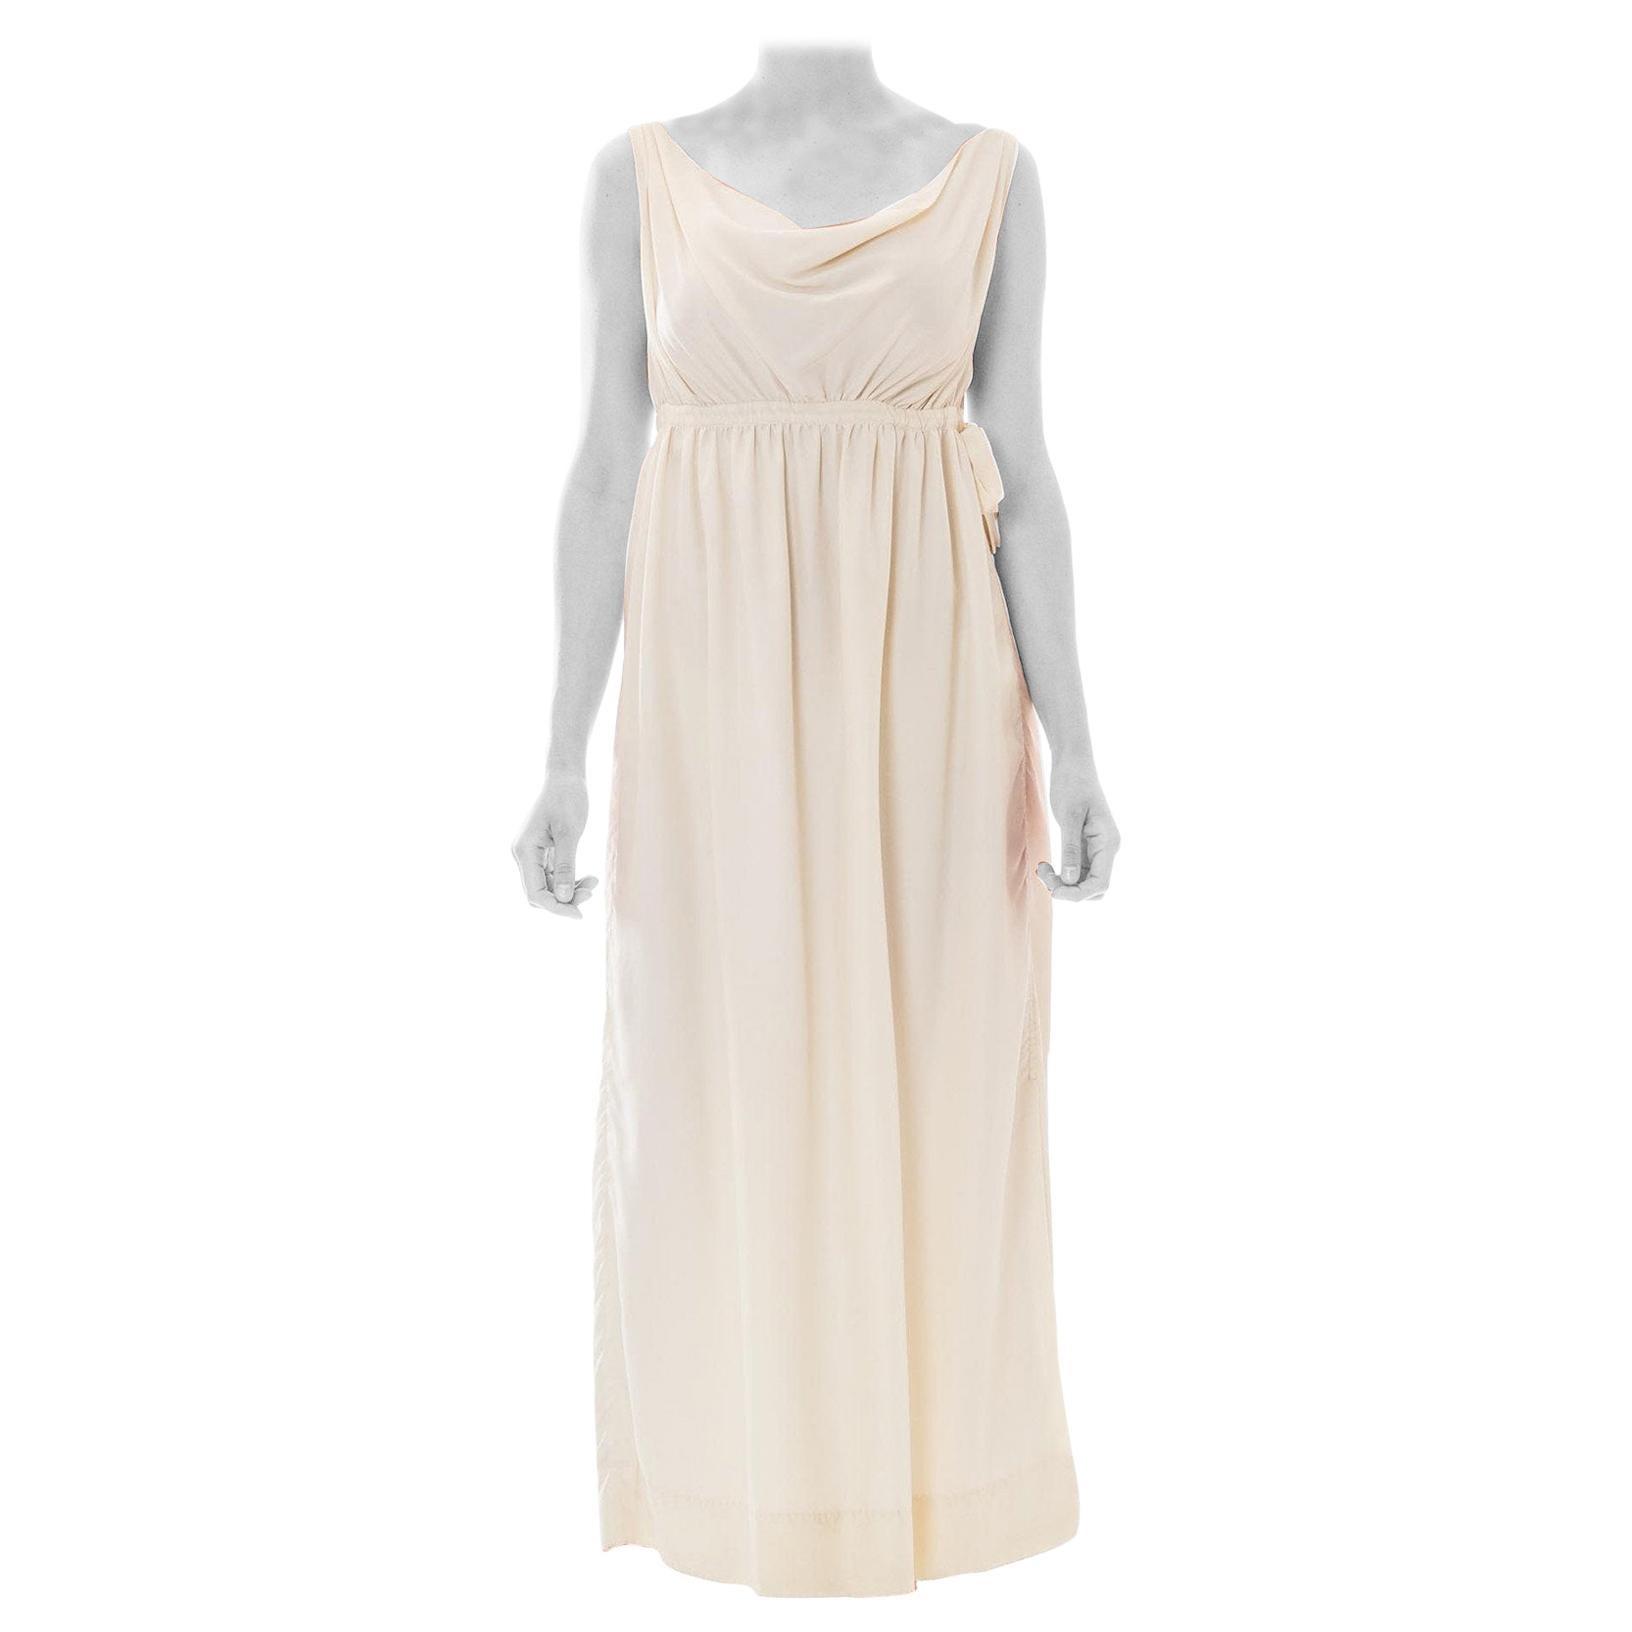 1960S ELIZABETH ARDEN Polyester Crepe De Chine Empire Waist Goddess Cowl Neck G